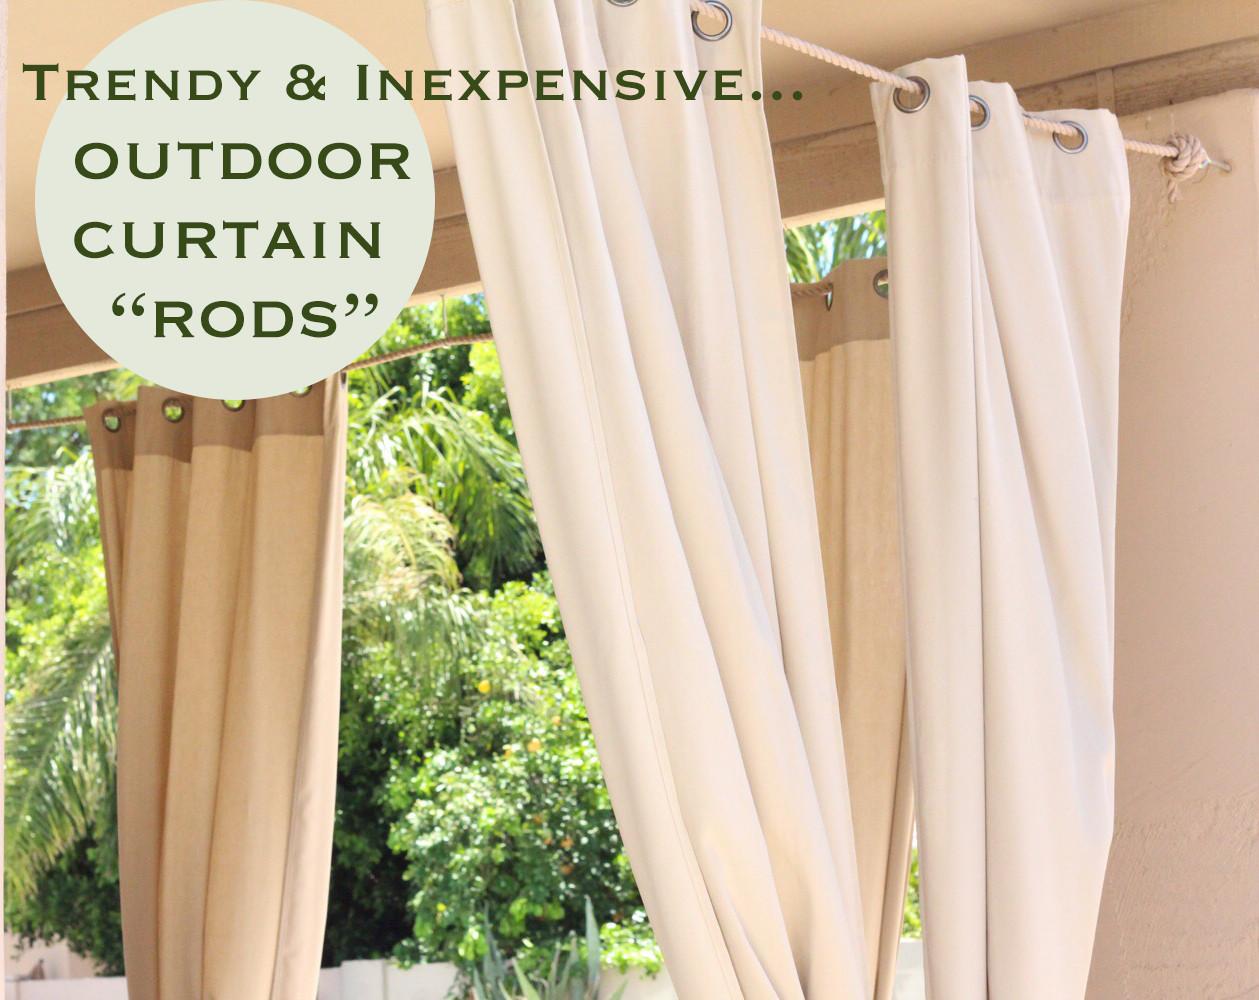 "DIY Outdoor Curtain Rod  Trendy & Inexpensive Outdoor Curtain ""Rods"" Retro"